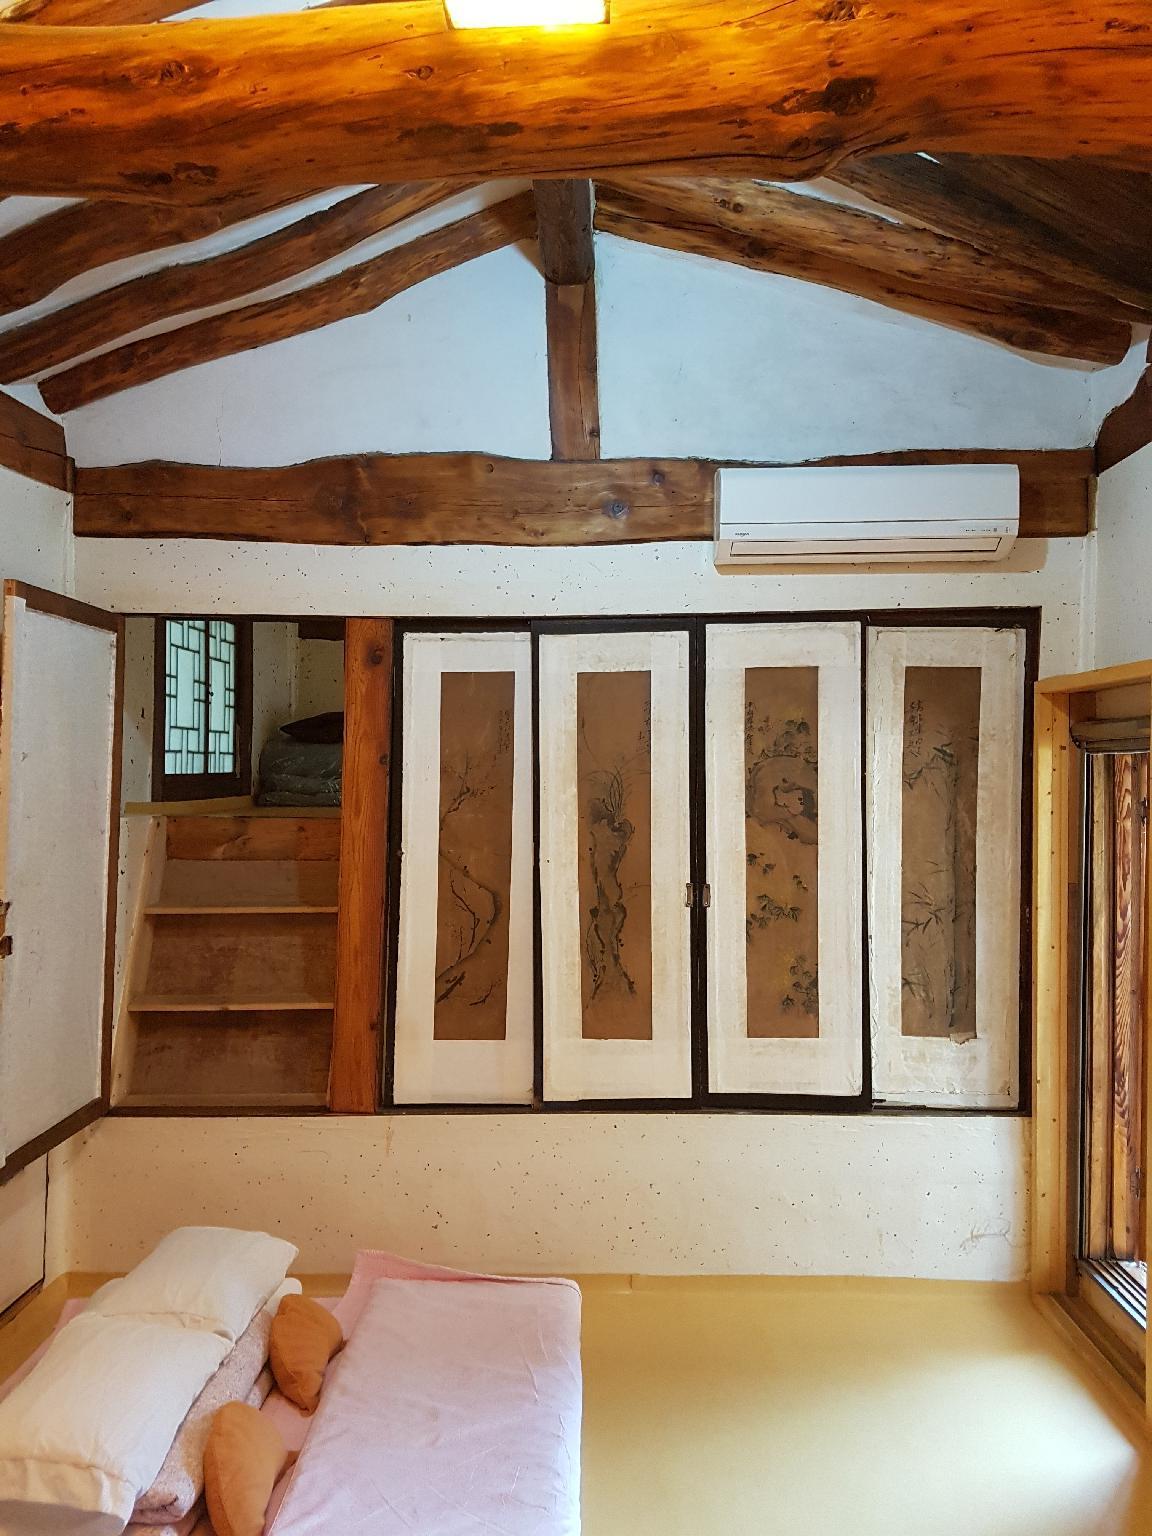 Gongsimga Hanok Guesthouse In Seoul